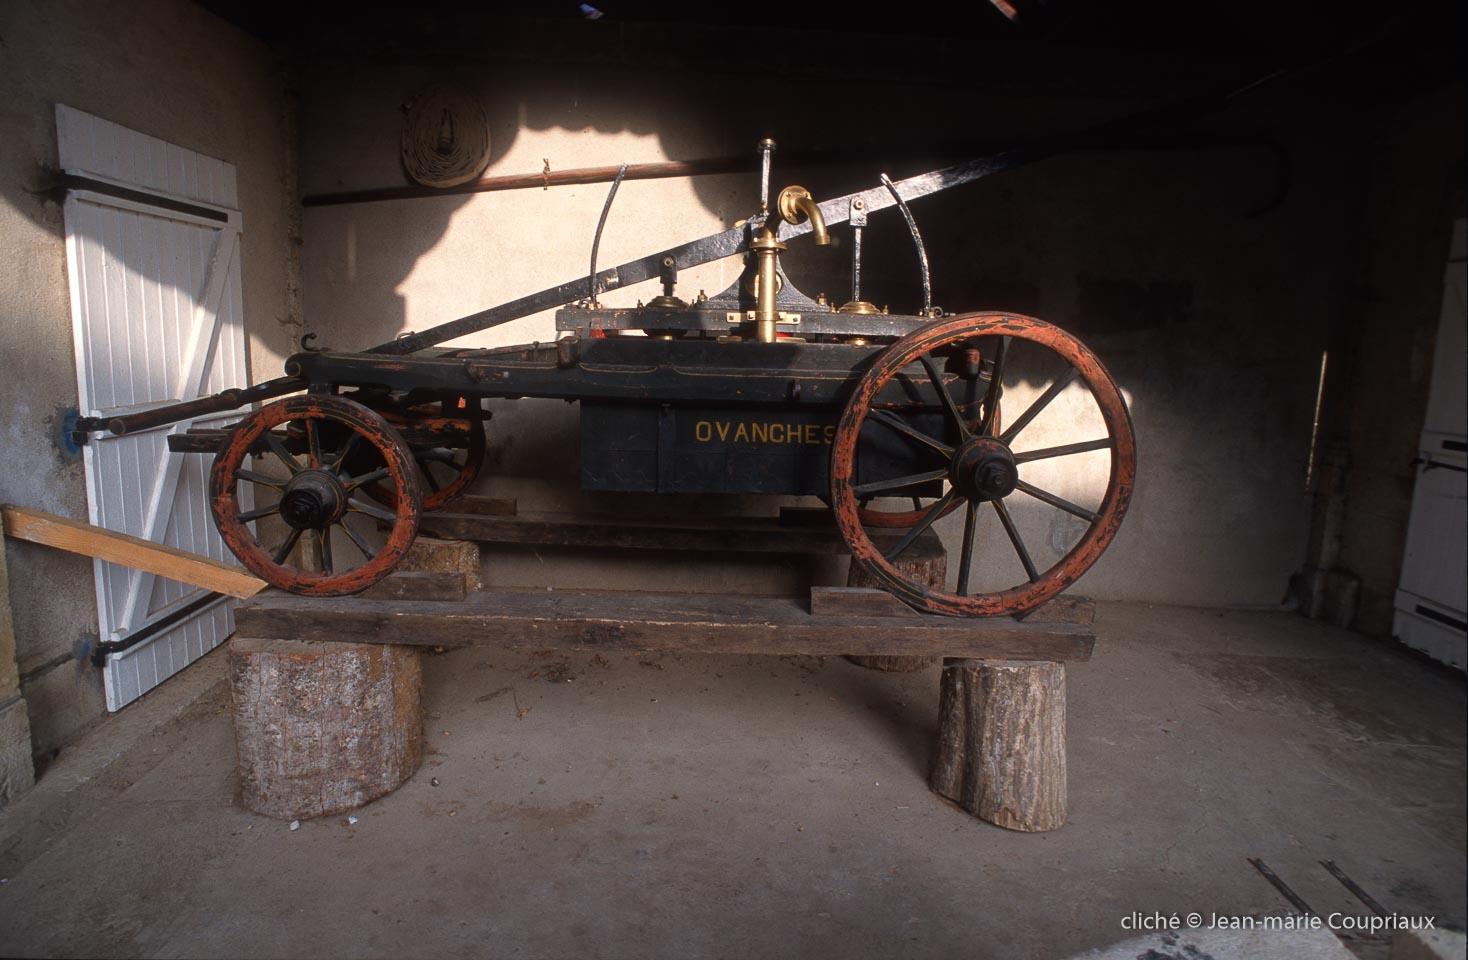 Ovanche-18-1